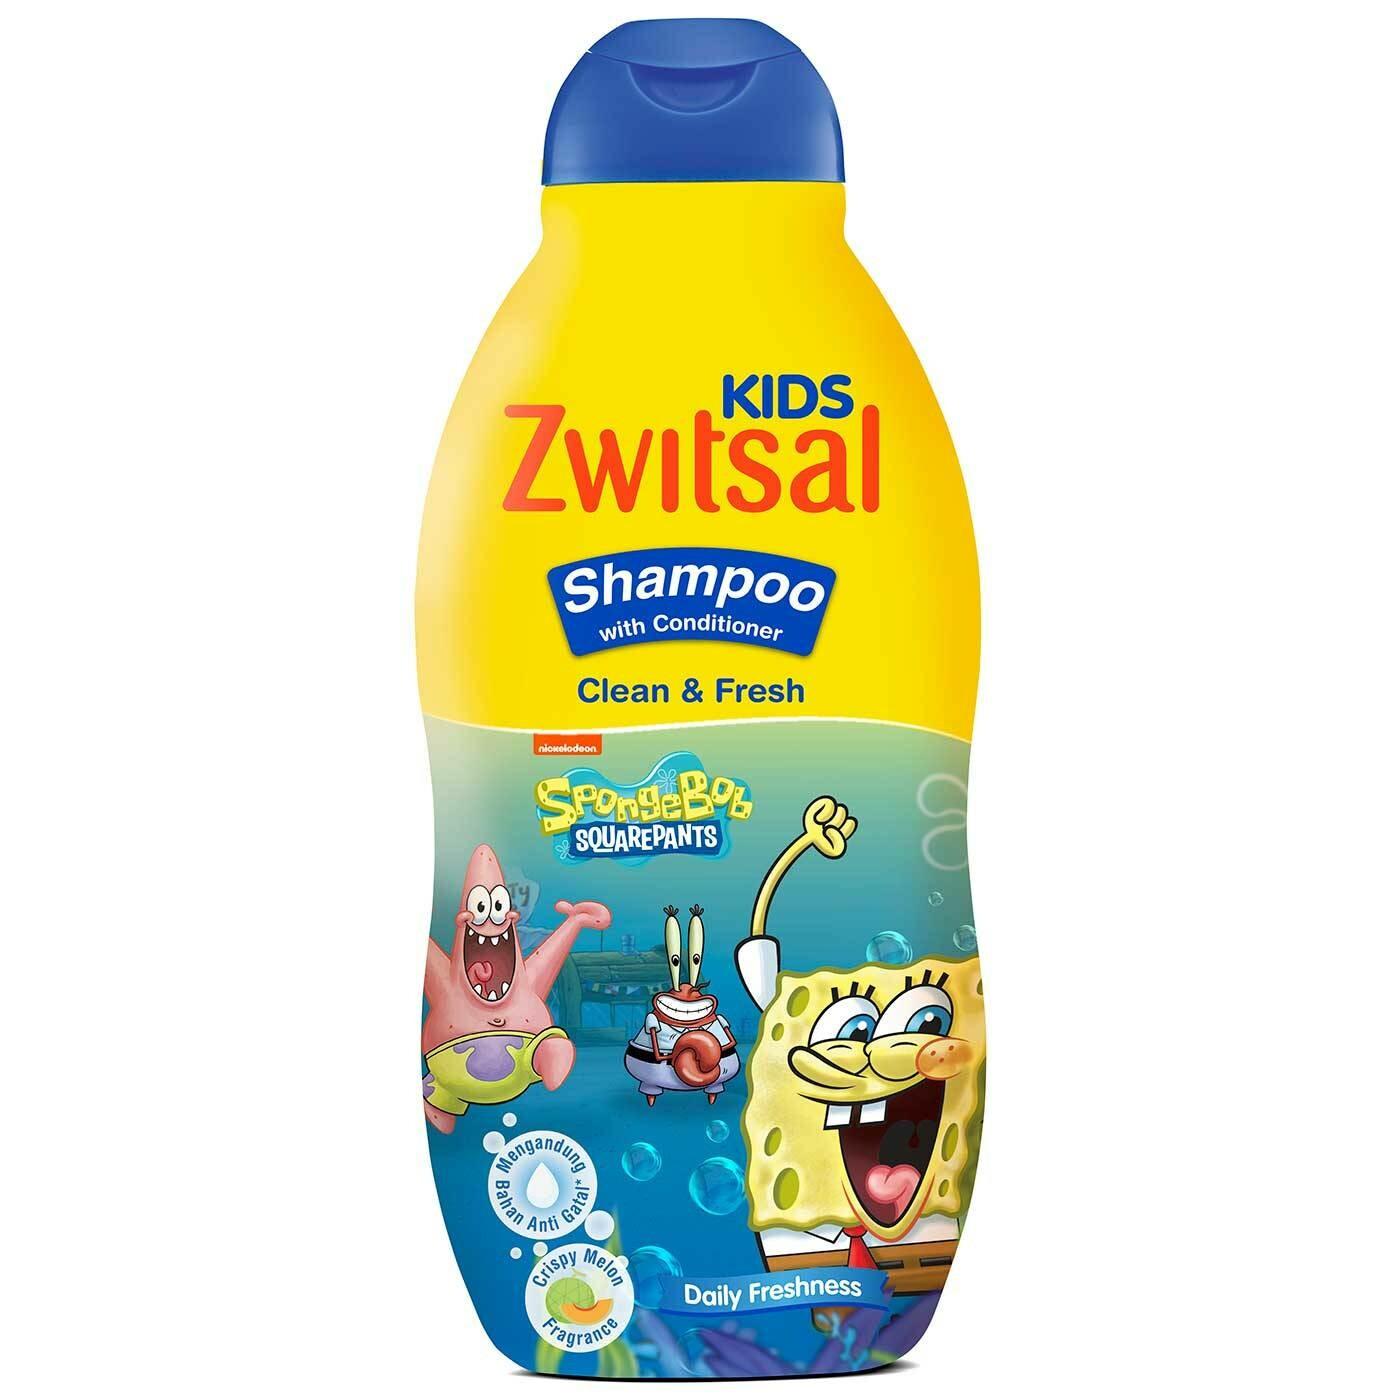 Product list image